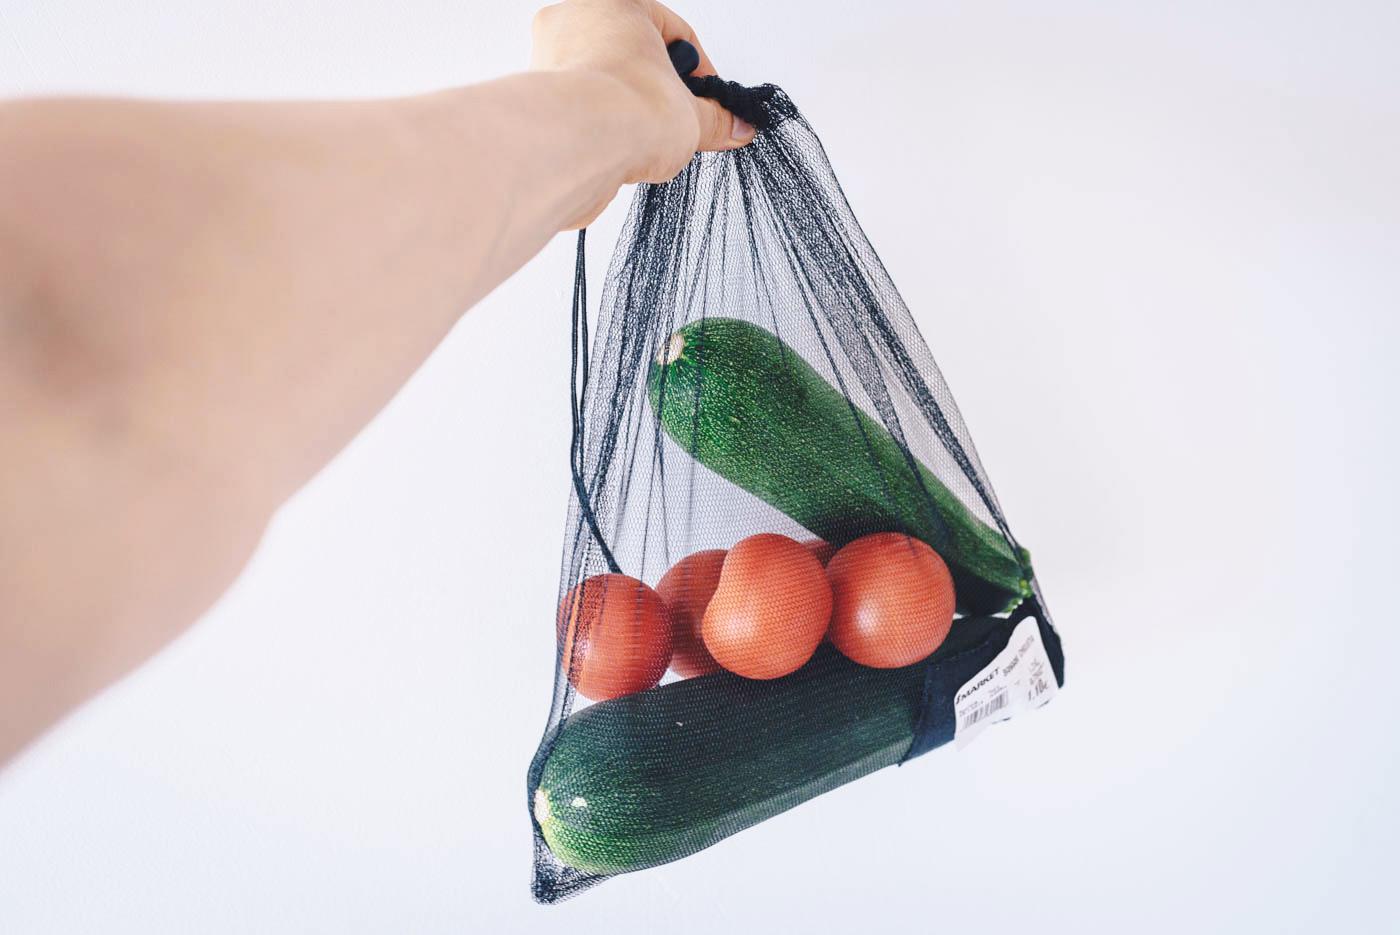 DIY: helppo itse tehty kestohedelmäpussi